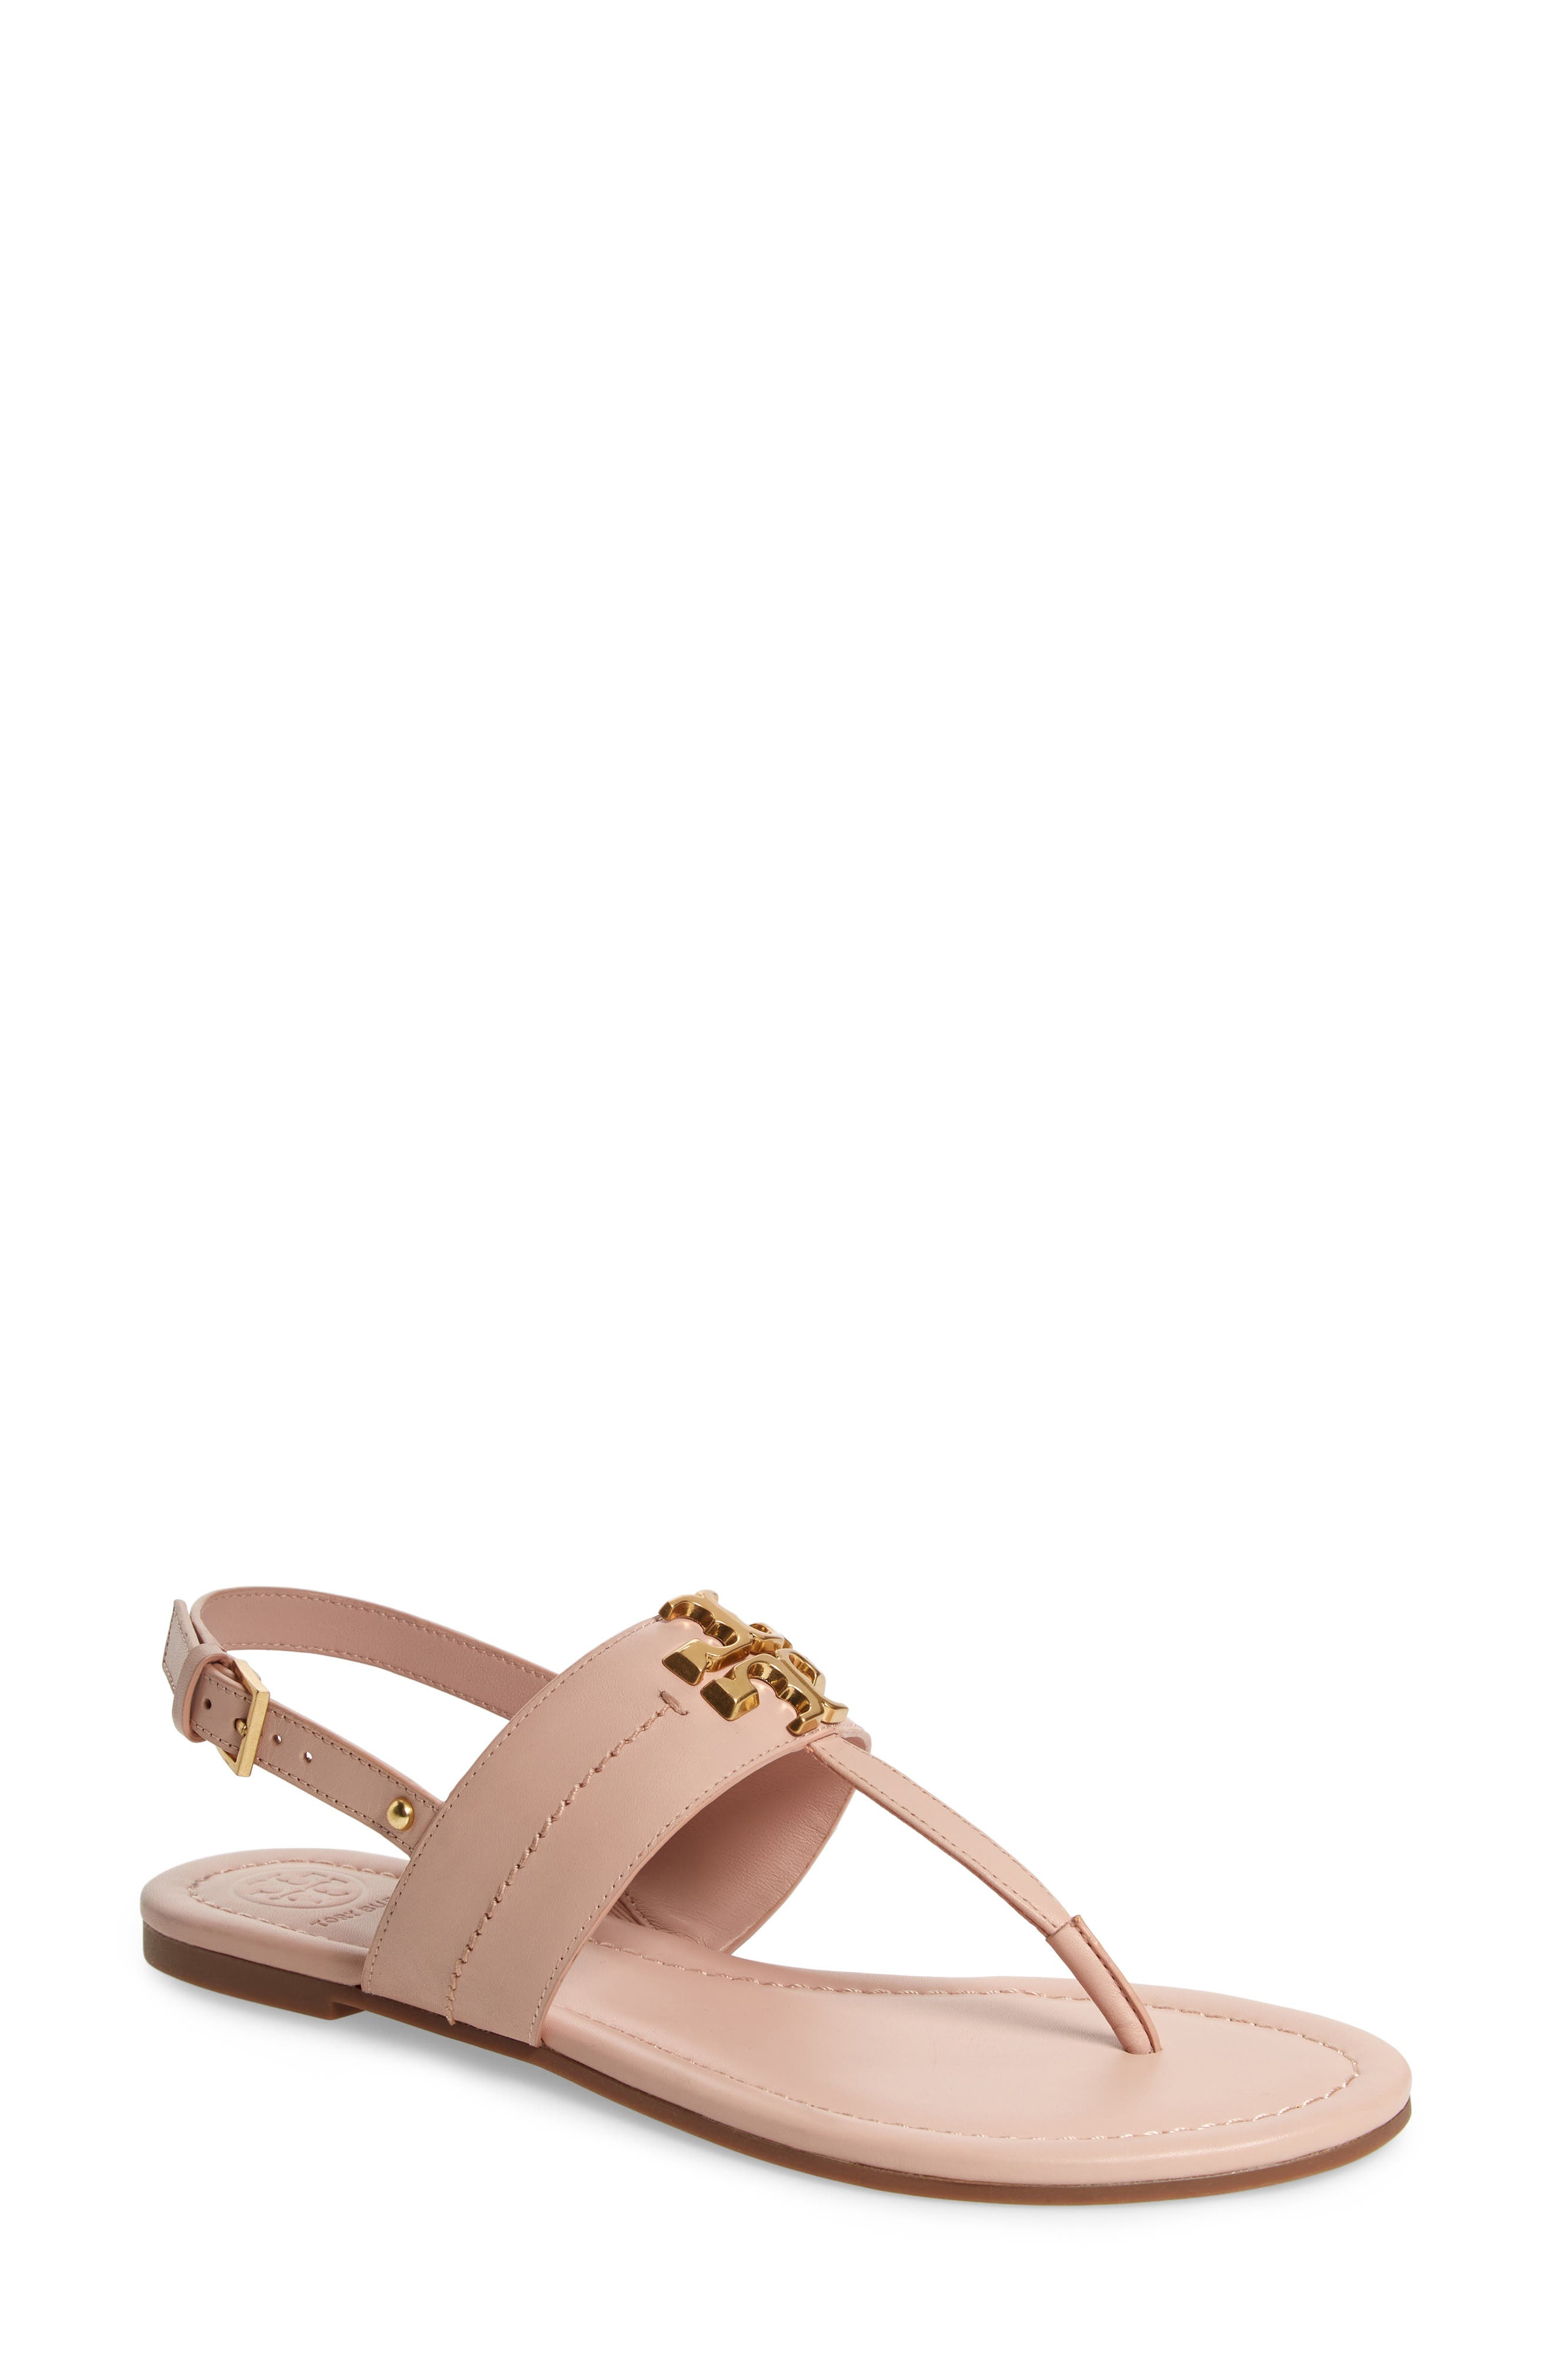 Tory Burch Everly T-Strap Flat Sandal (Women)